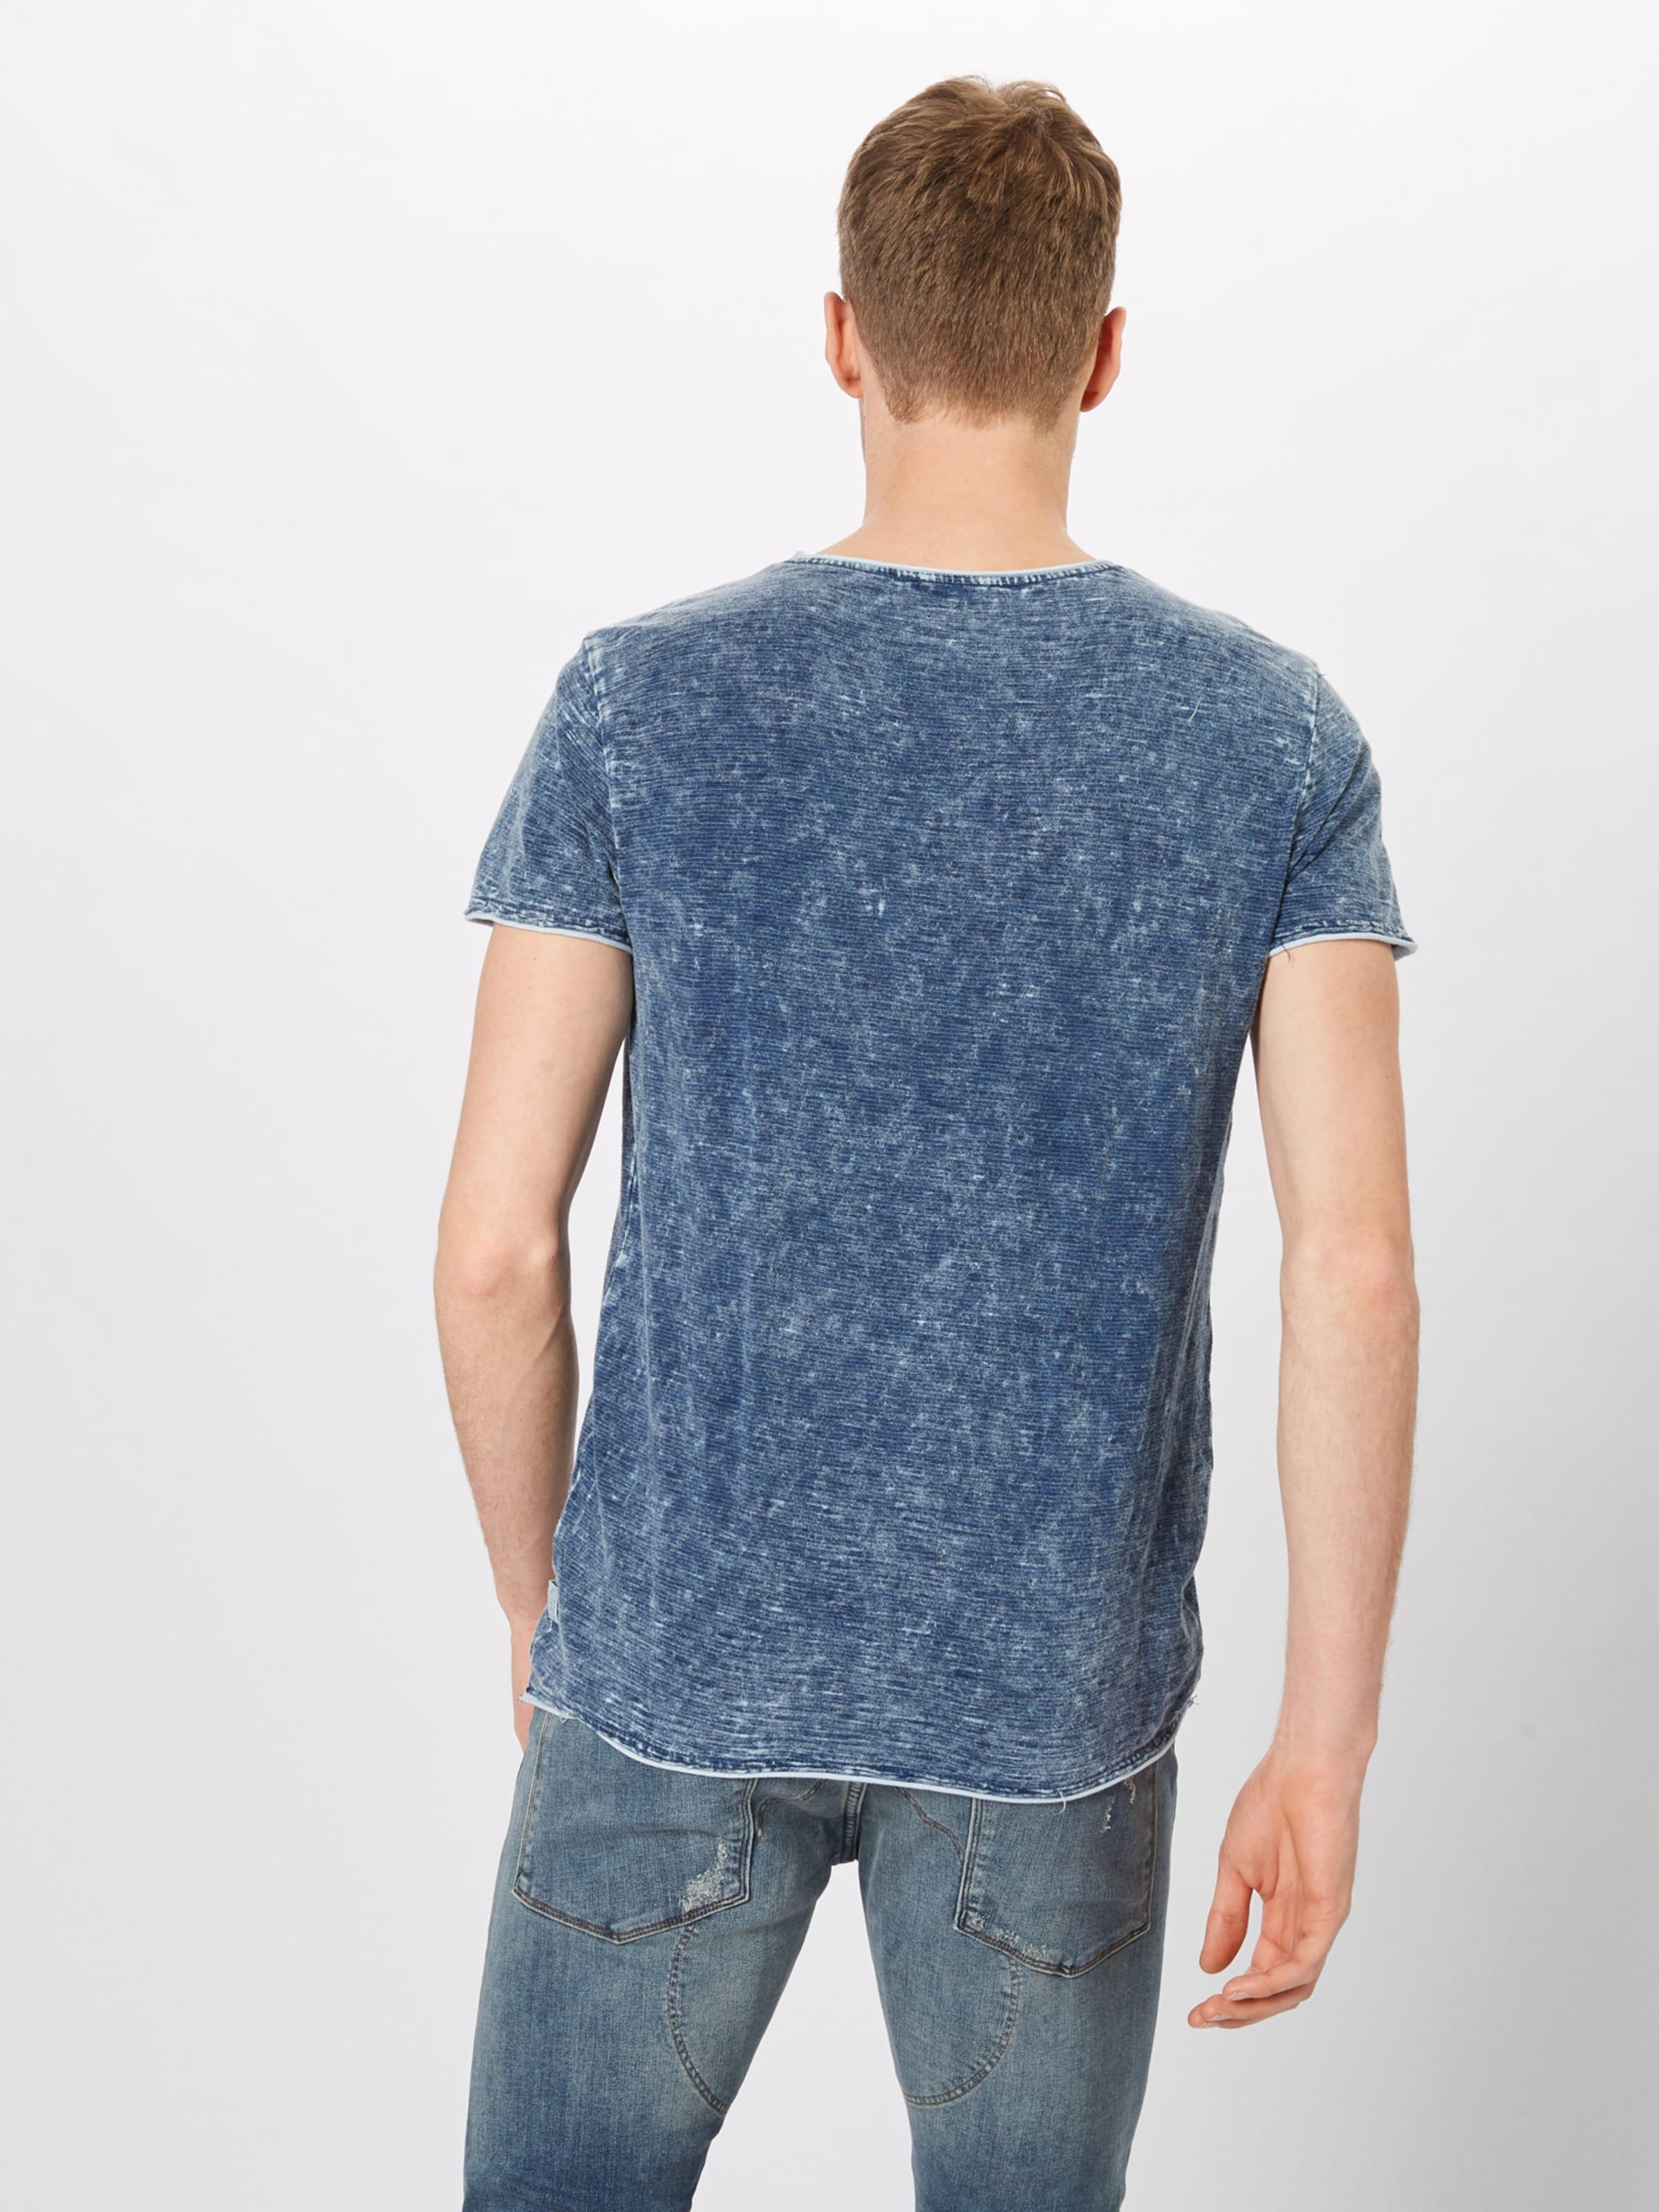 En Hw2ide9 Shirt Ltb T 'gilosa' Indigo dCWxrBeo